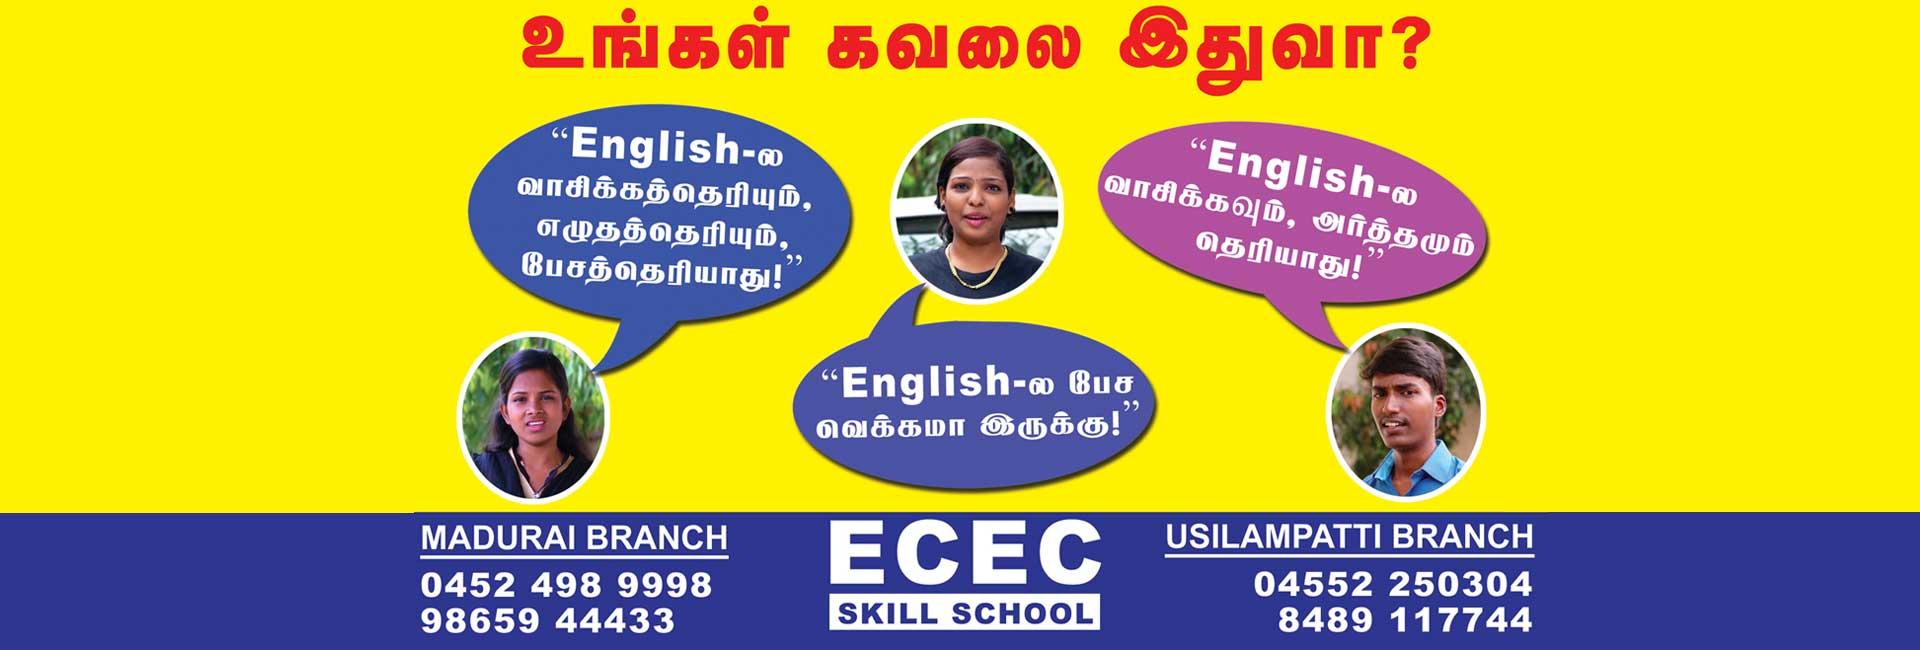 ECEC Skill School